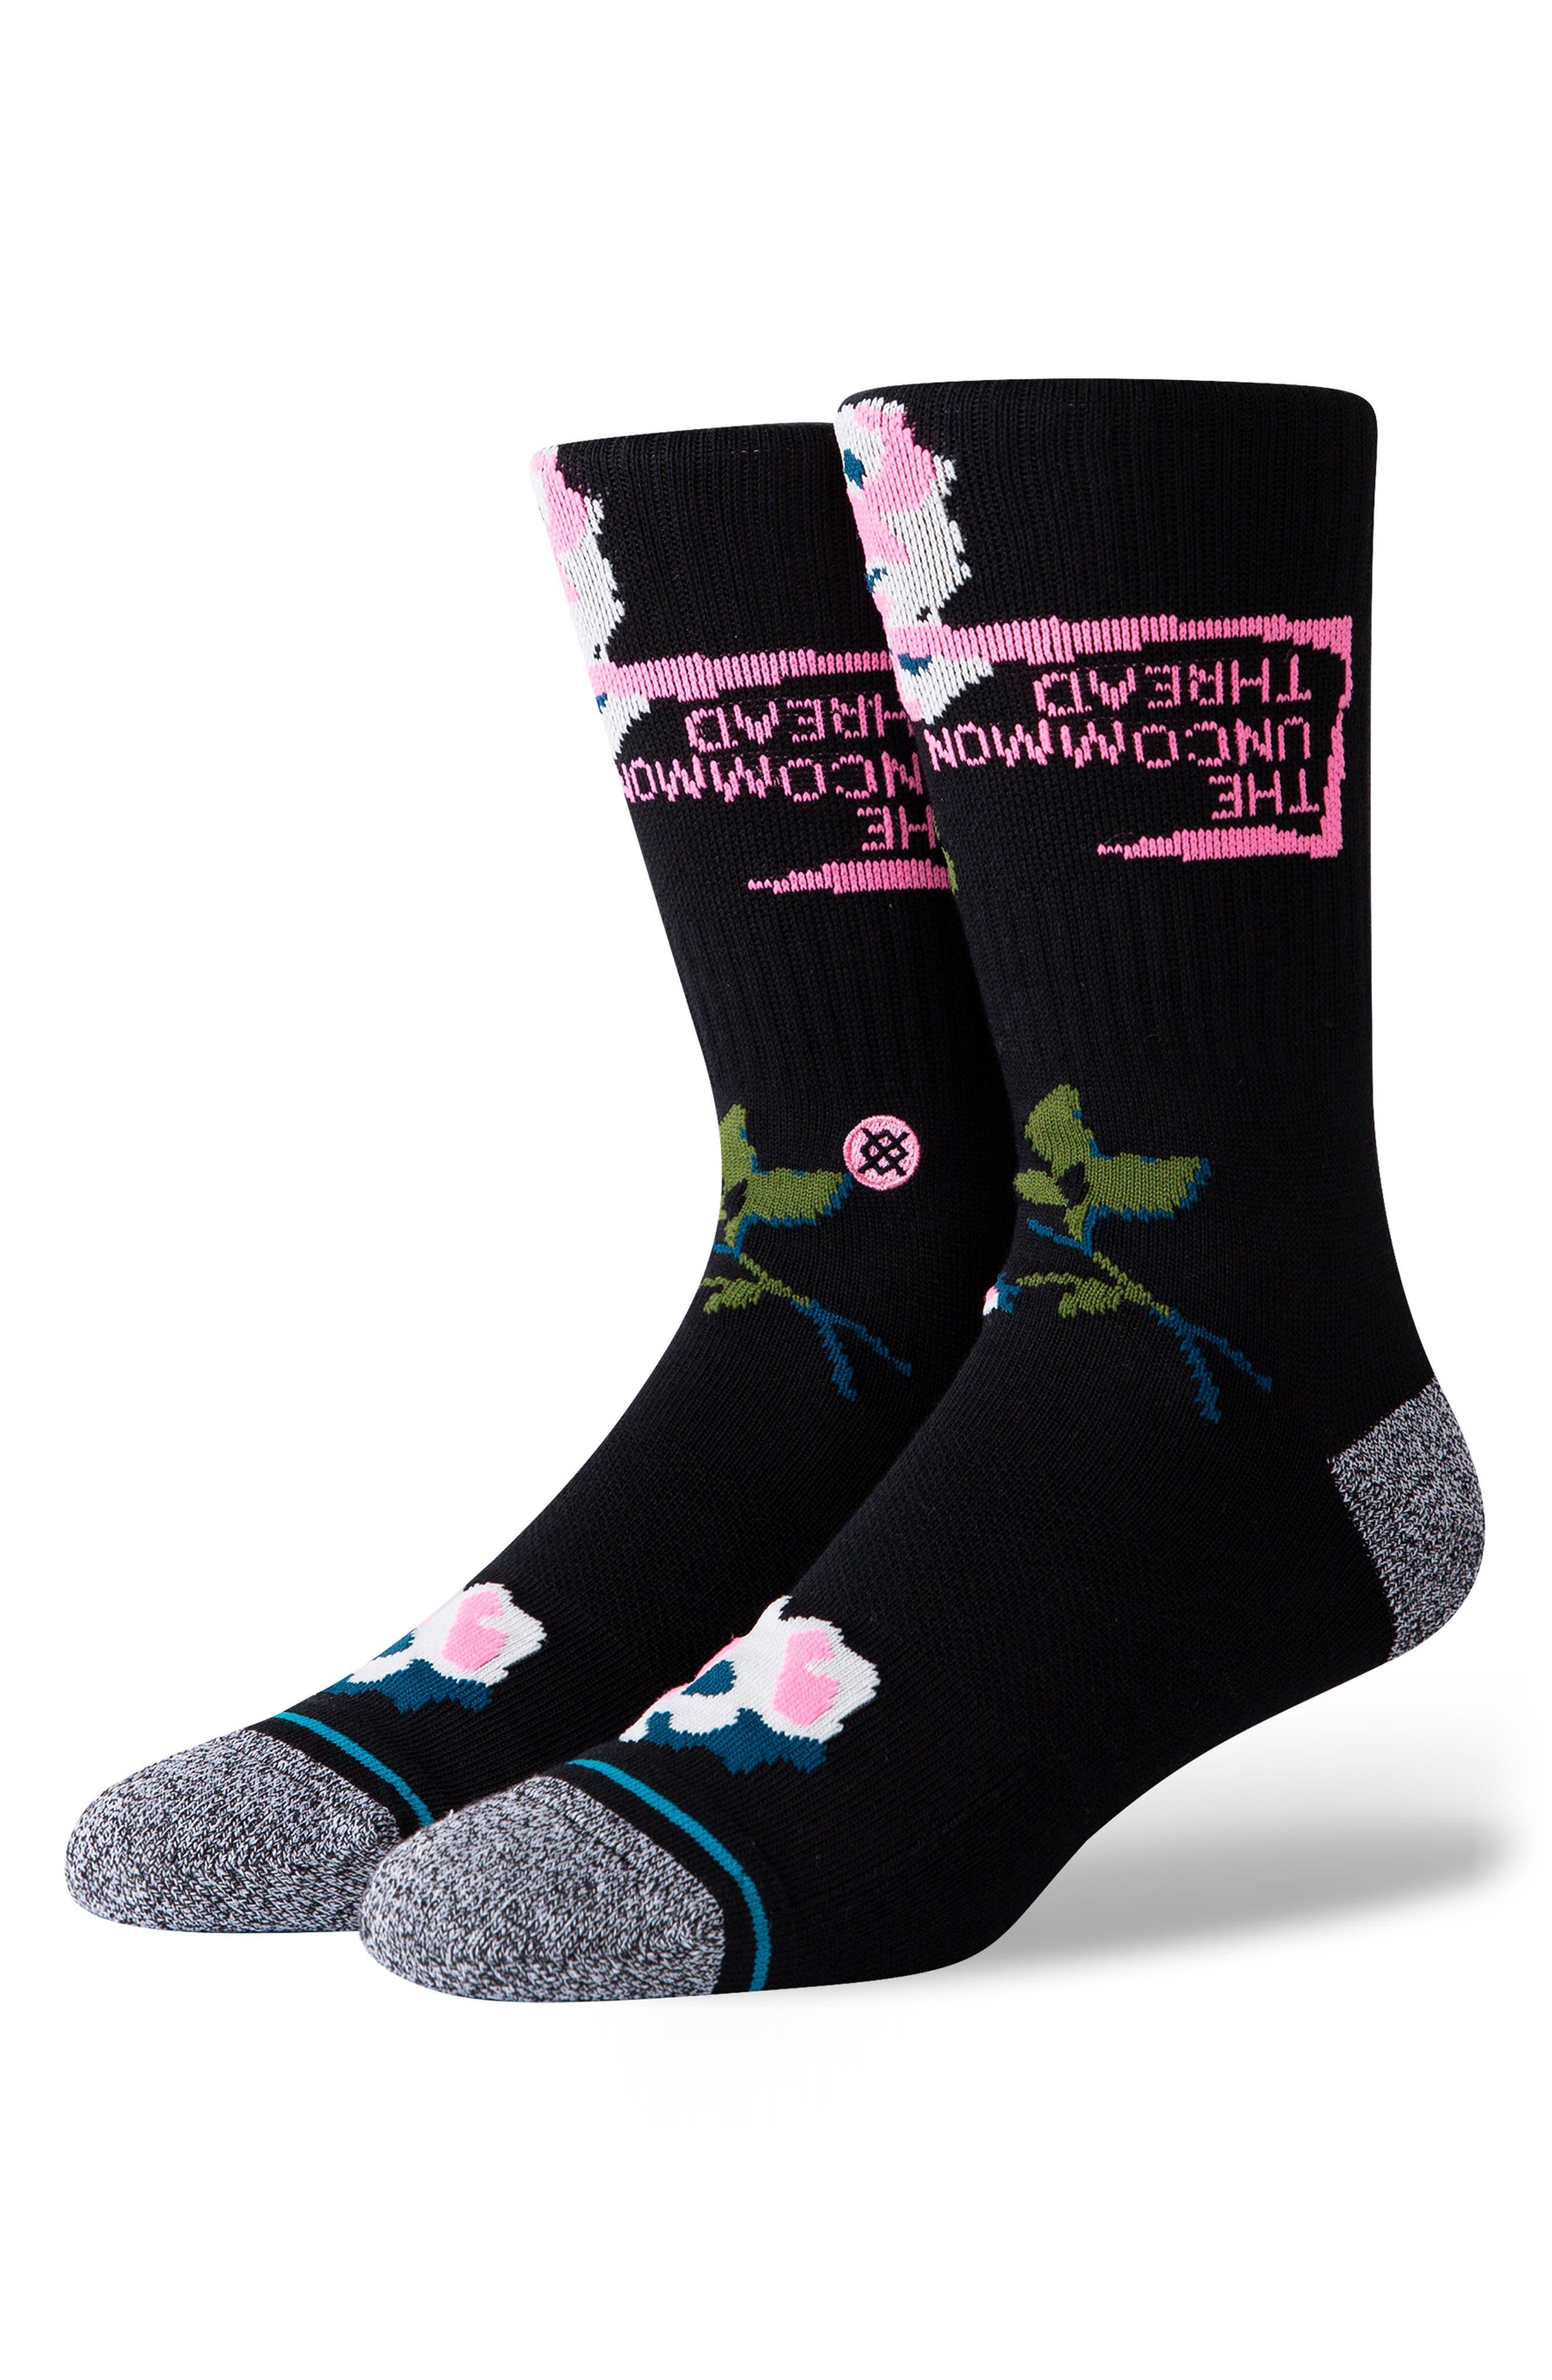 Image of Stance Mundus Novus Socks